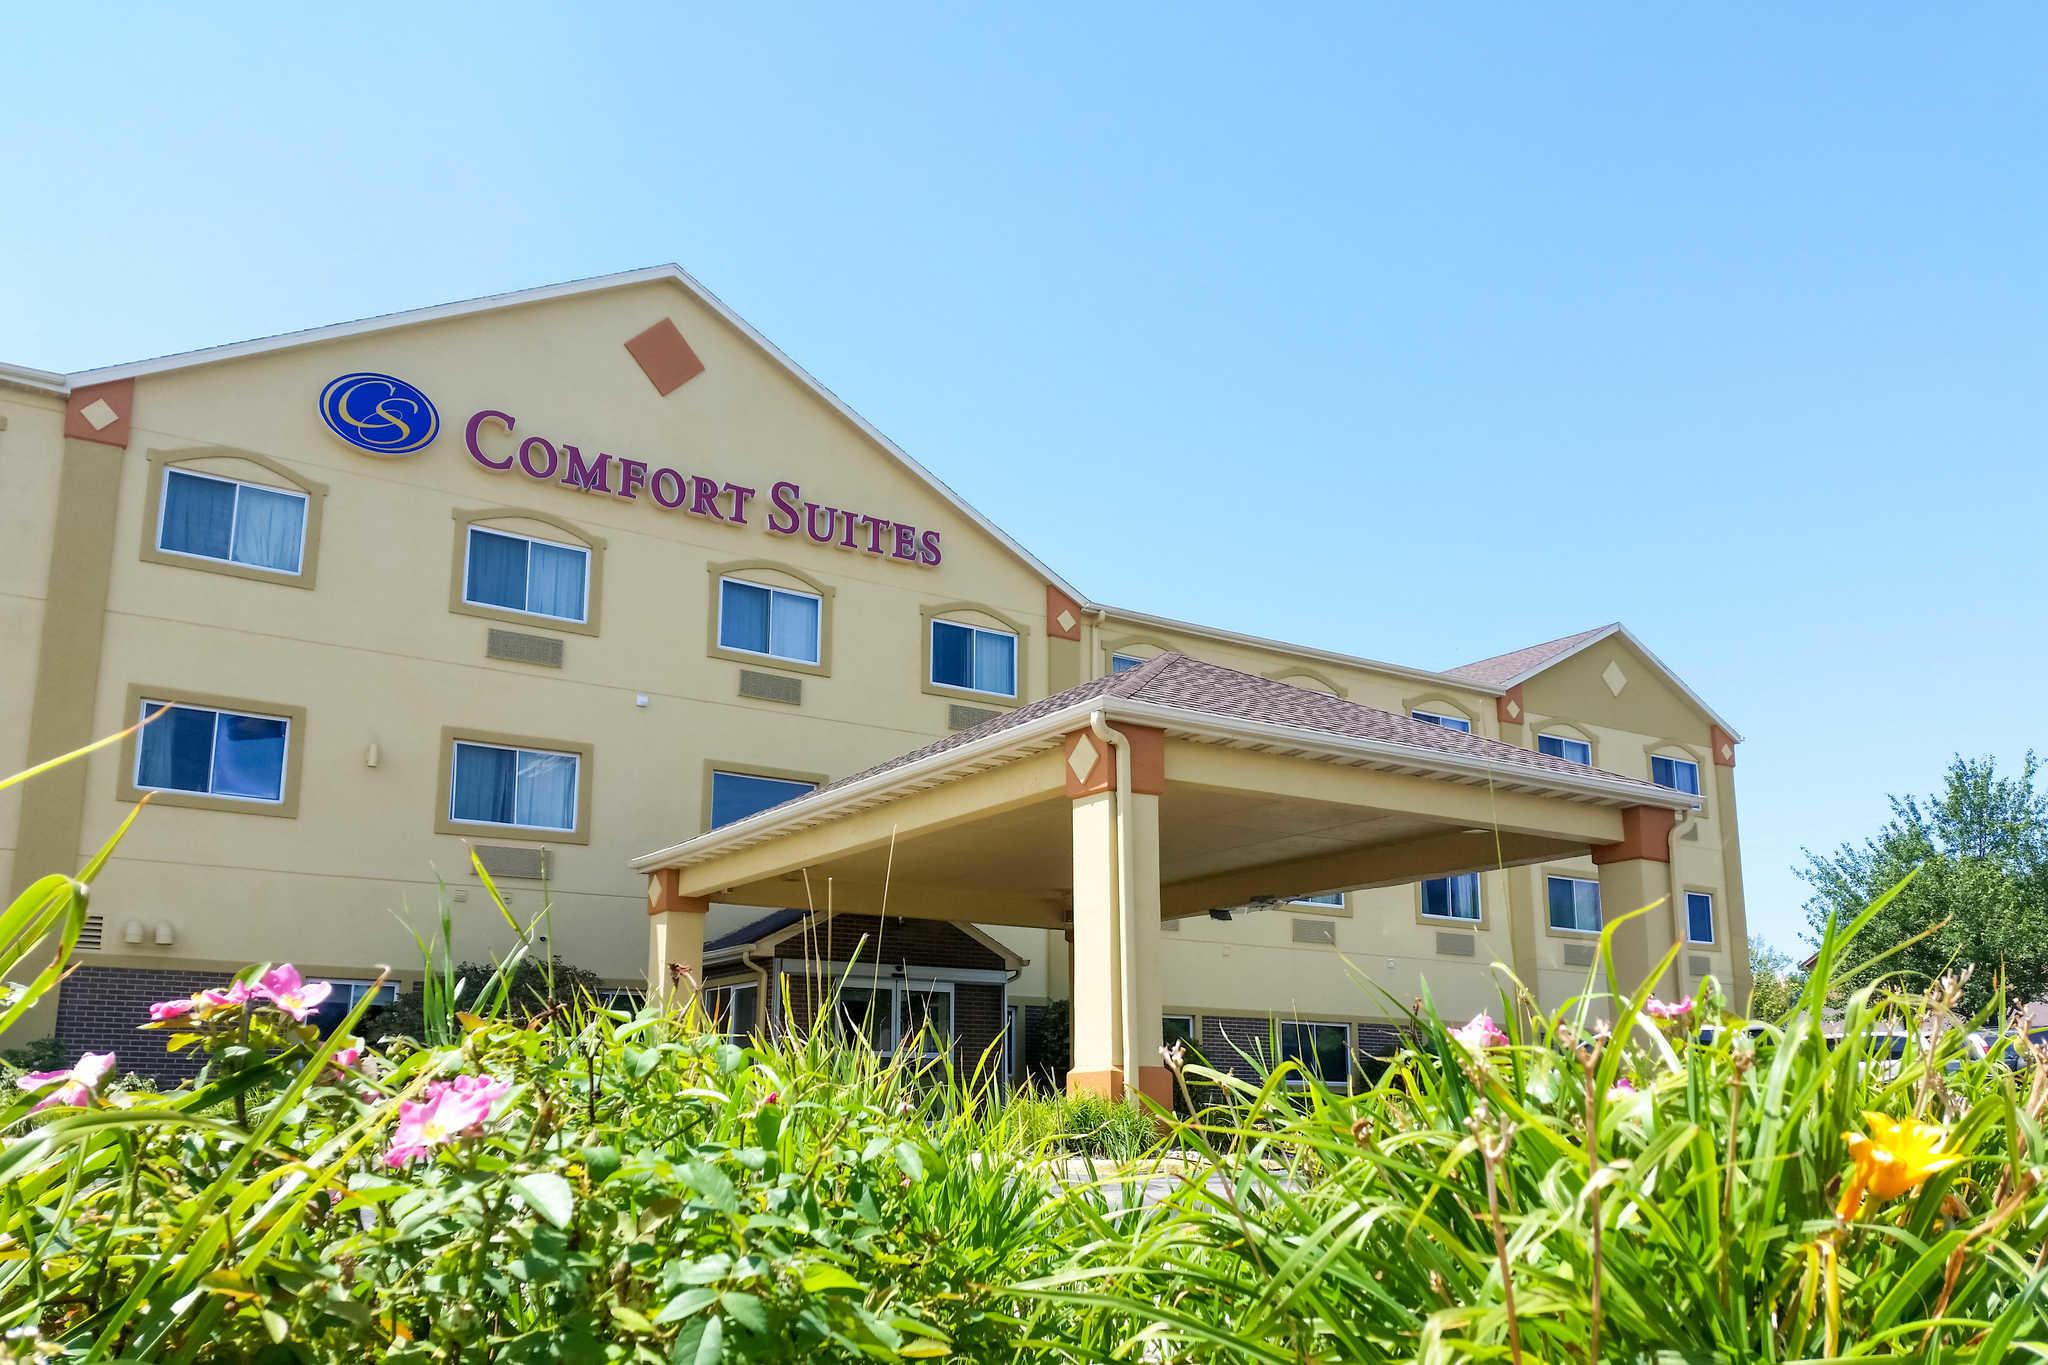 sofa for van singapore extra large pillows comfort suites 10503 bedford avenue omaha ne n49